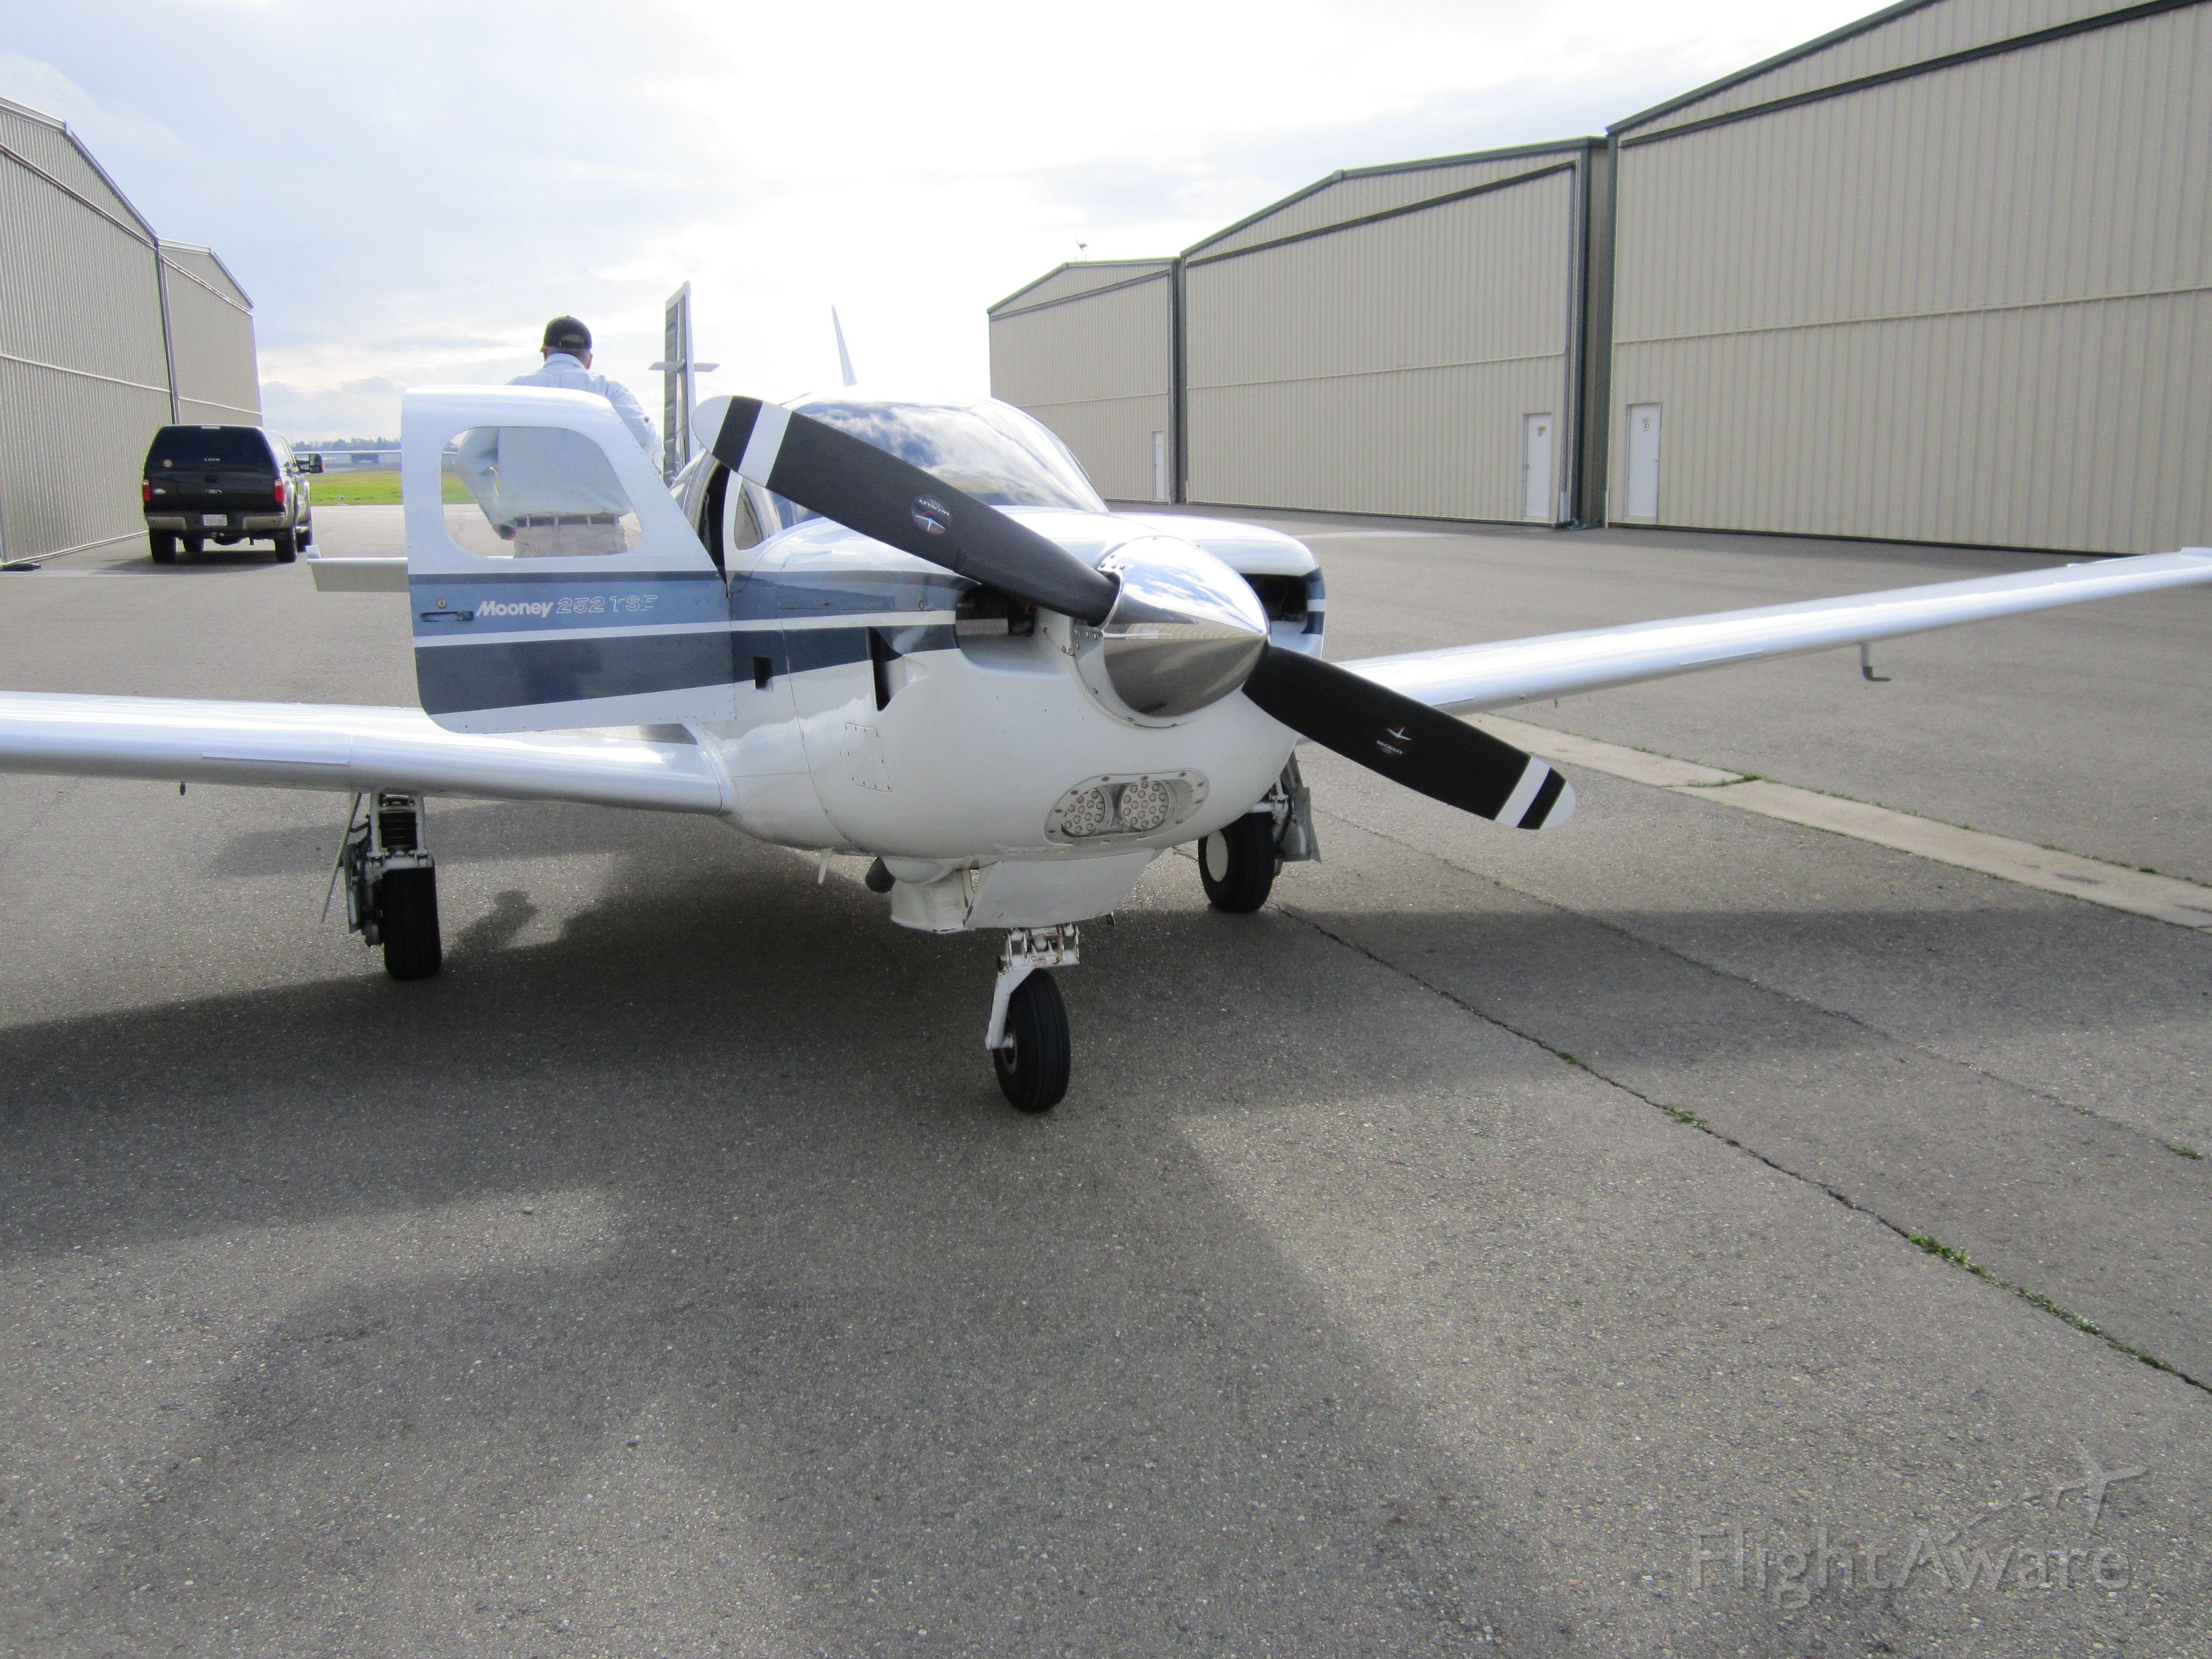 Mooney M-20 (N252YY) - LINCOLN AIRPORT, CA, USA    01.26.2013